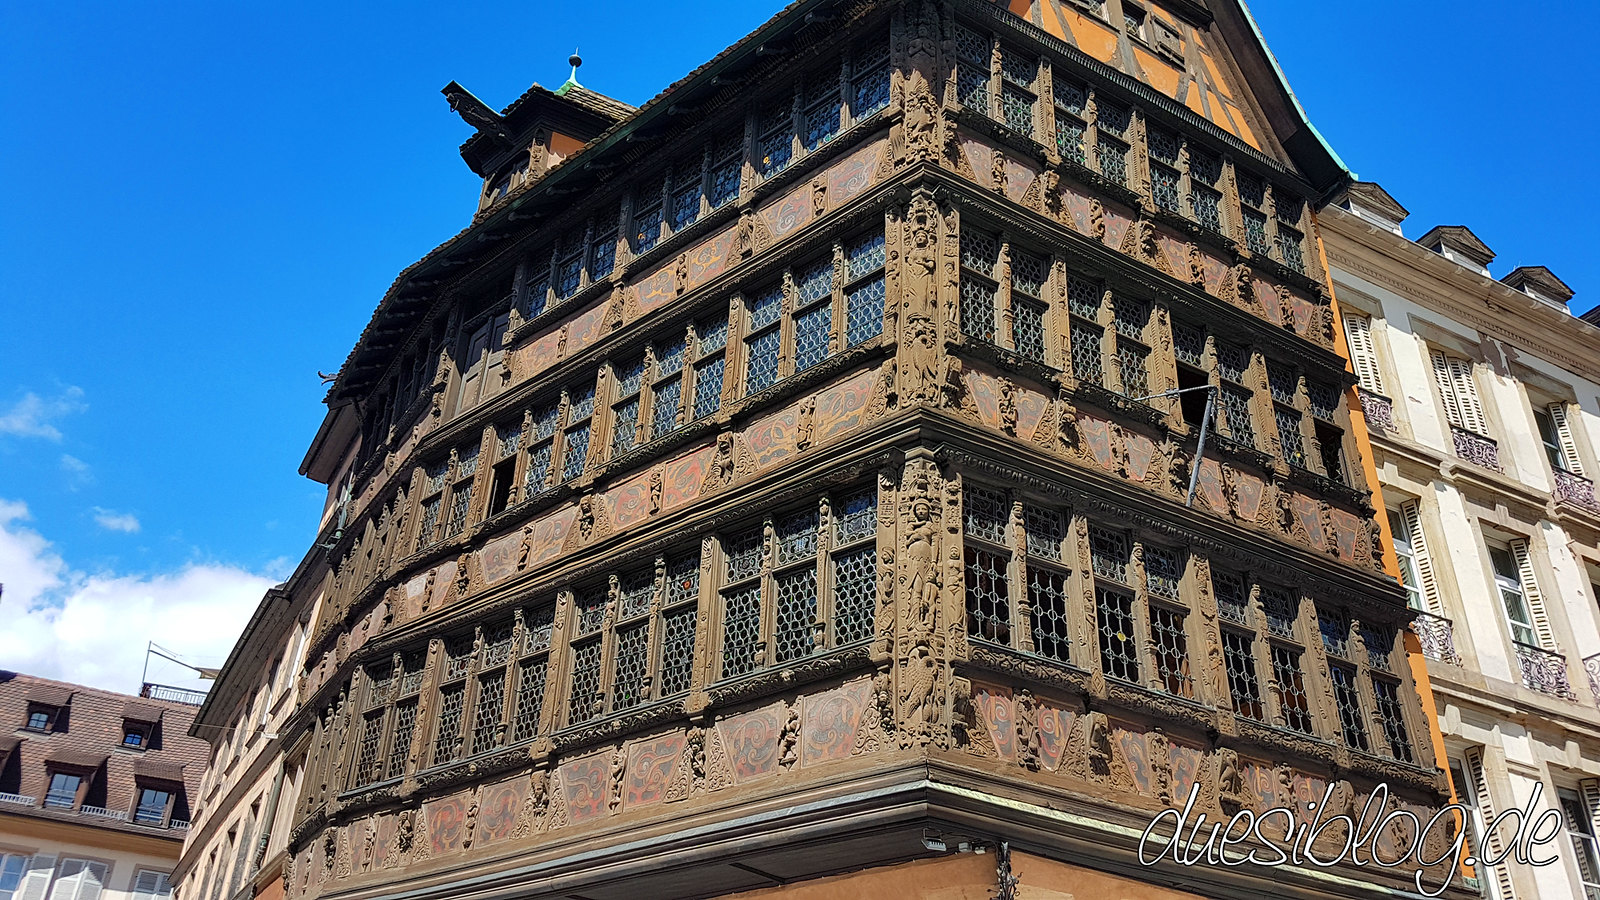 Maison Kammerzell Strasbourg duesiblog travelblog 03